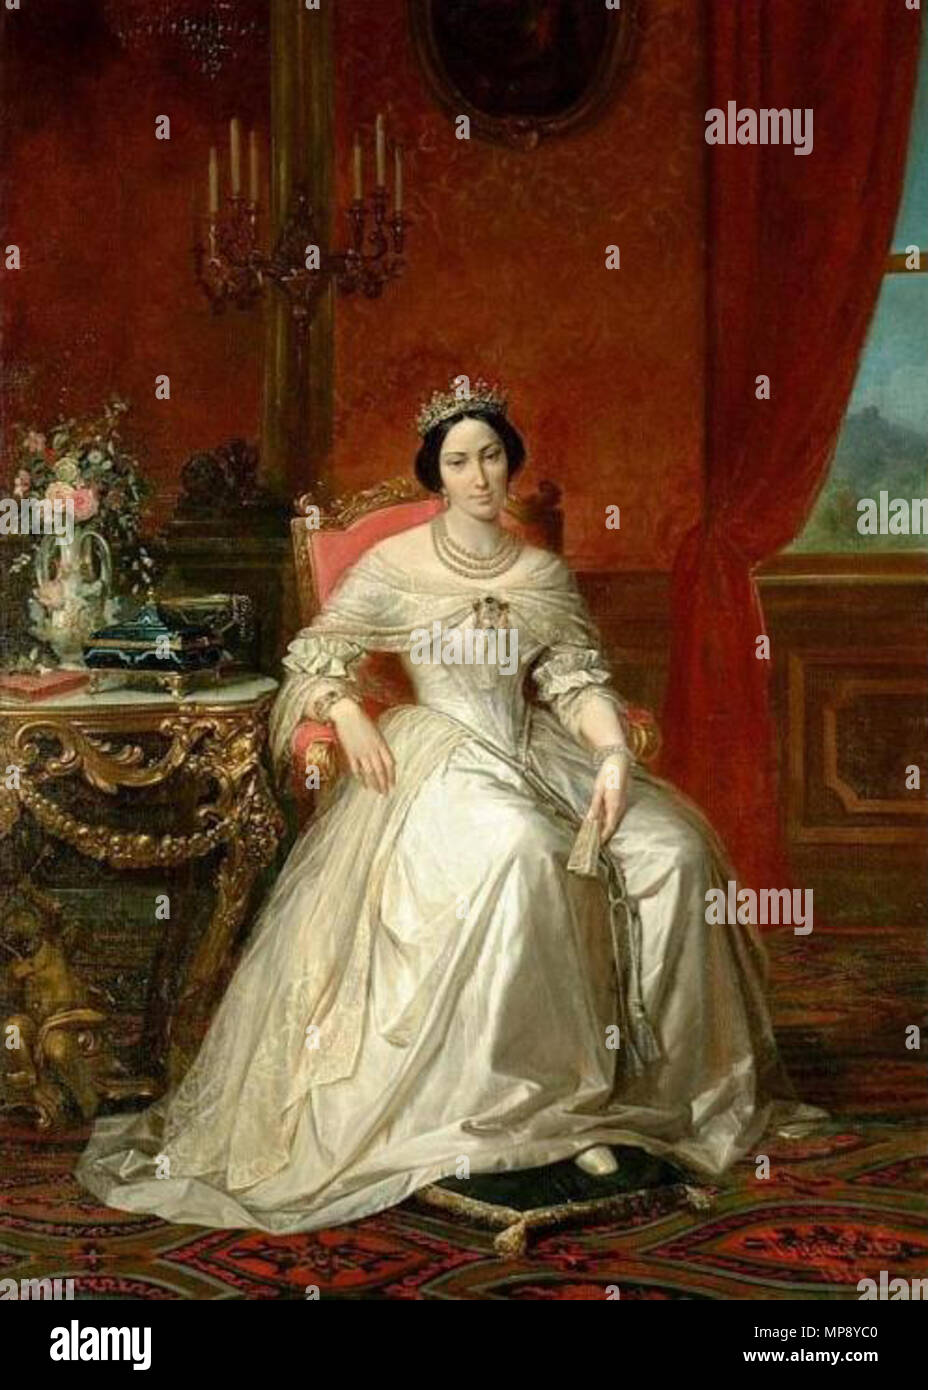 Queen Adelaide : queen, adelaide, English:, Portrait, Queen, Adelaide, Villa, Della, Regina, Circa, 1853., Adelaide,, Stock, Photo, Alamy